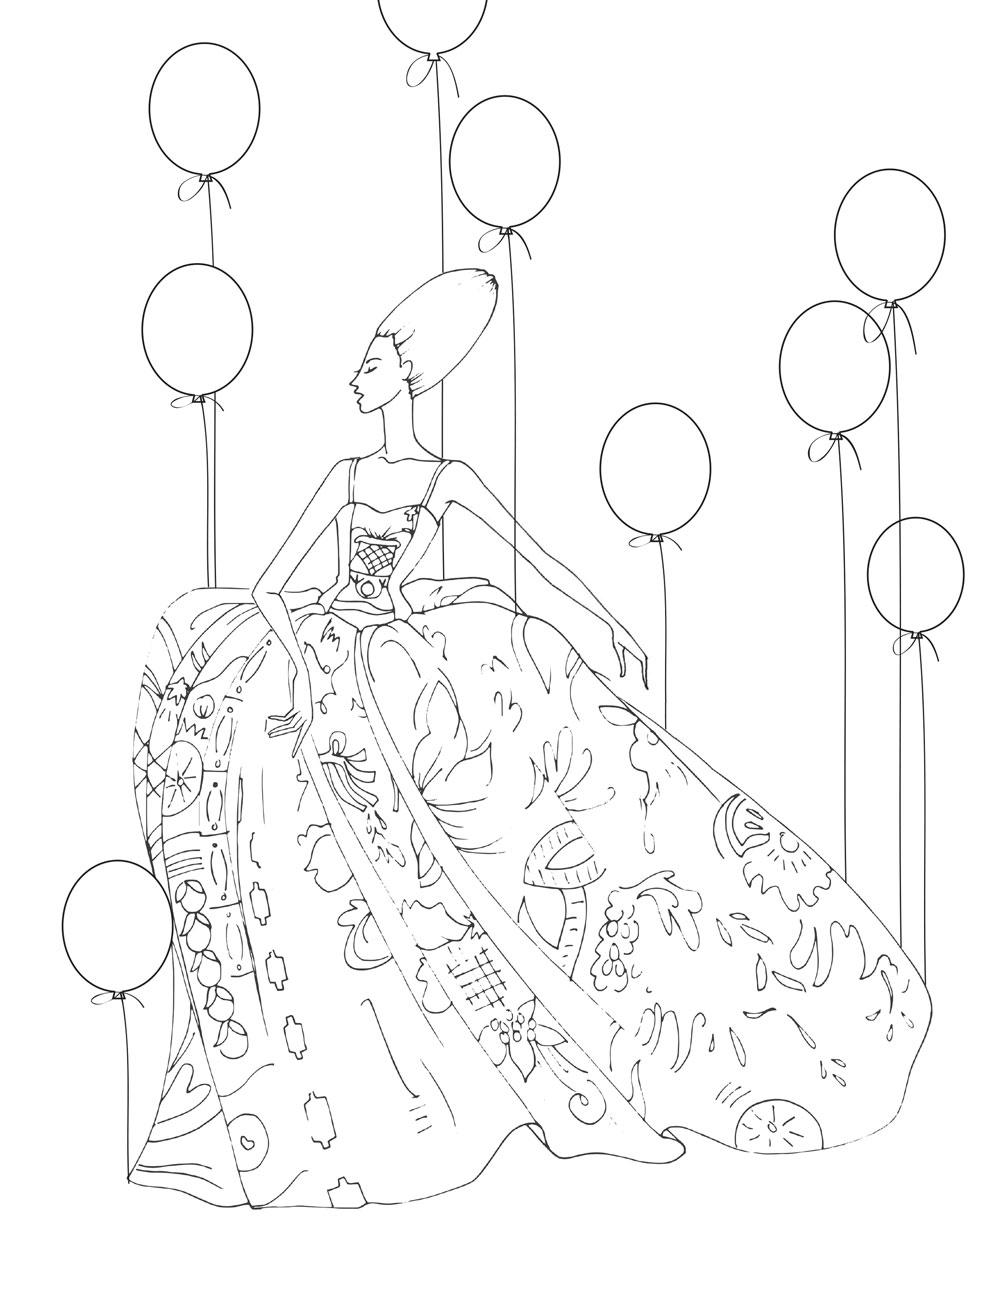 Coloring Book Design by Stefani Greenwood